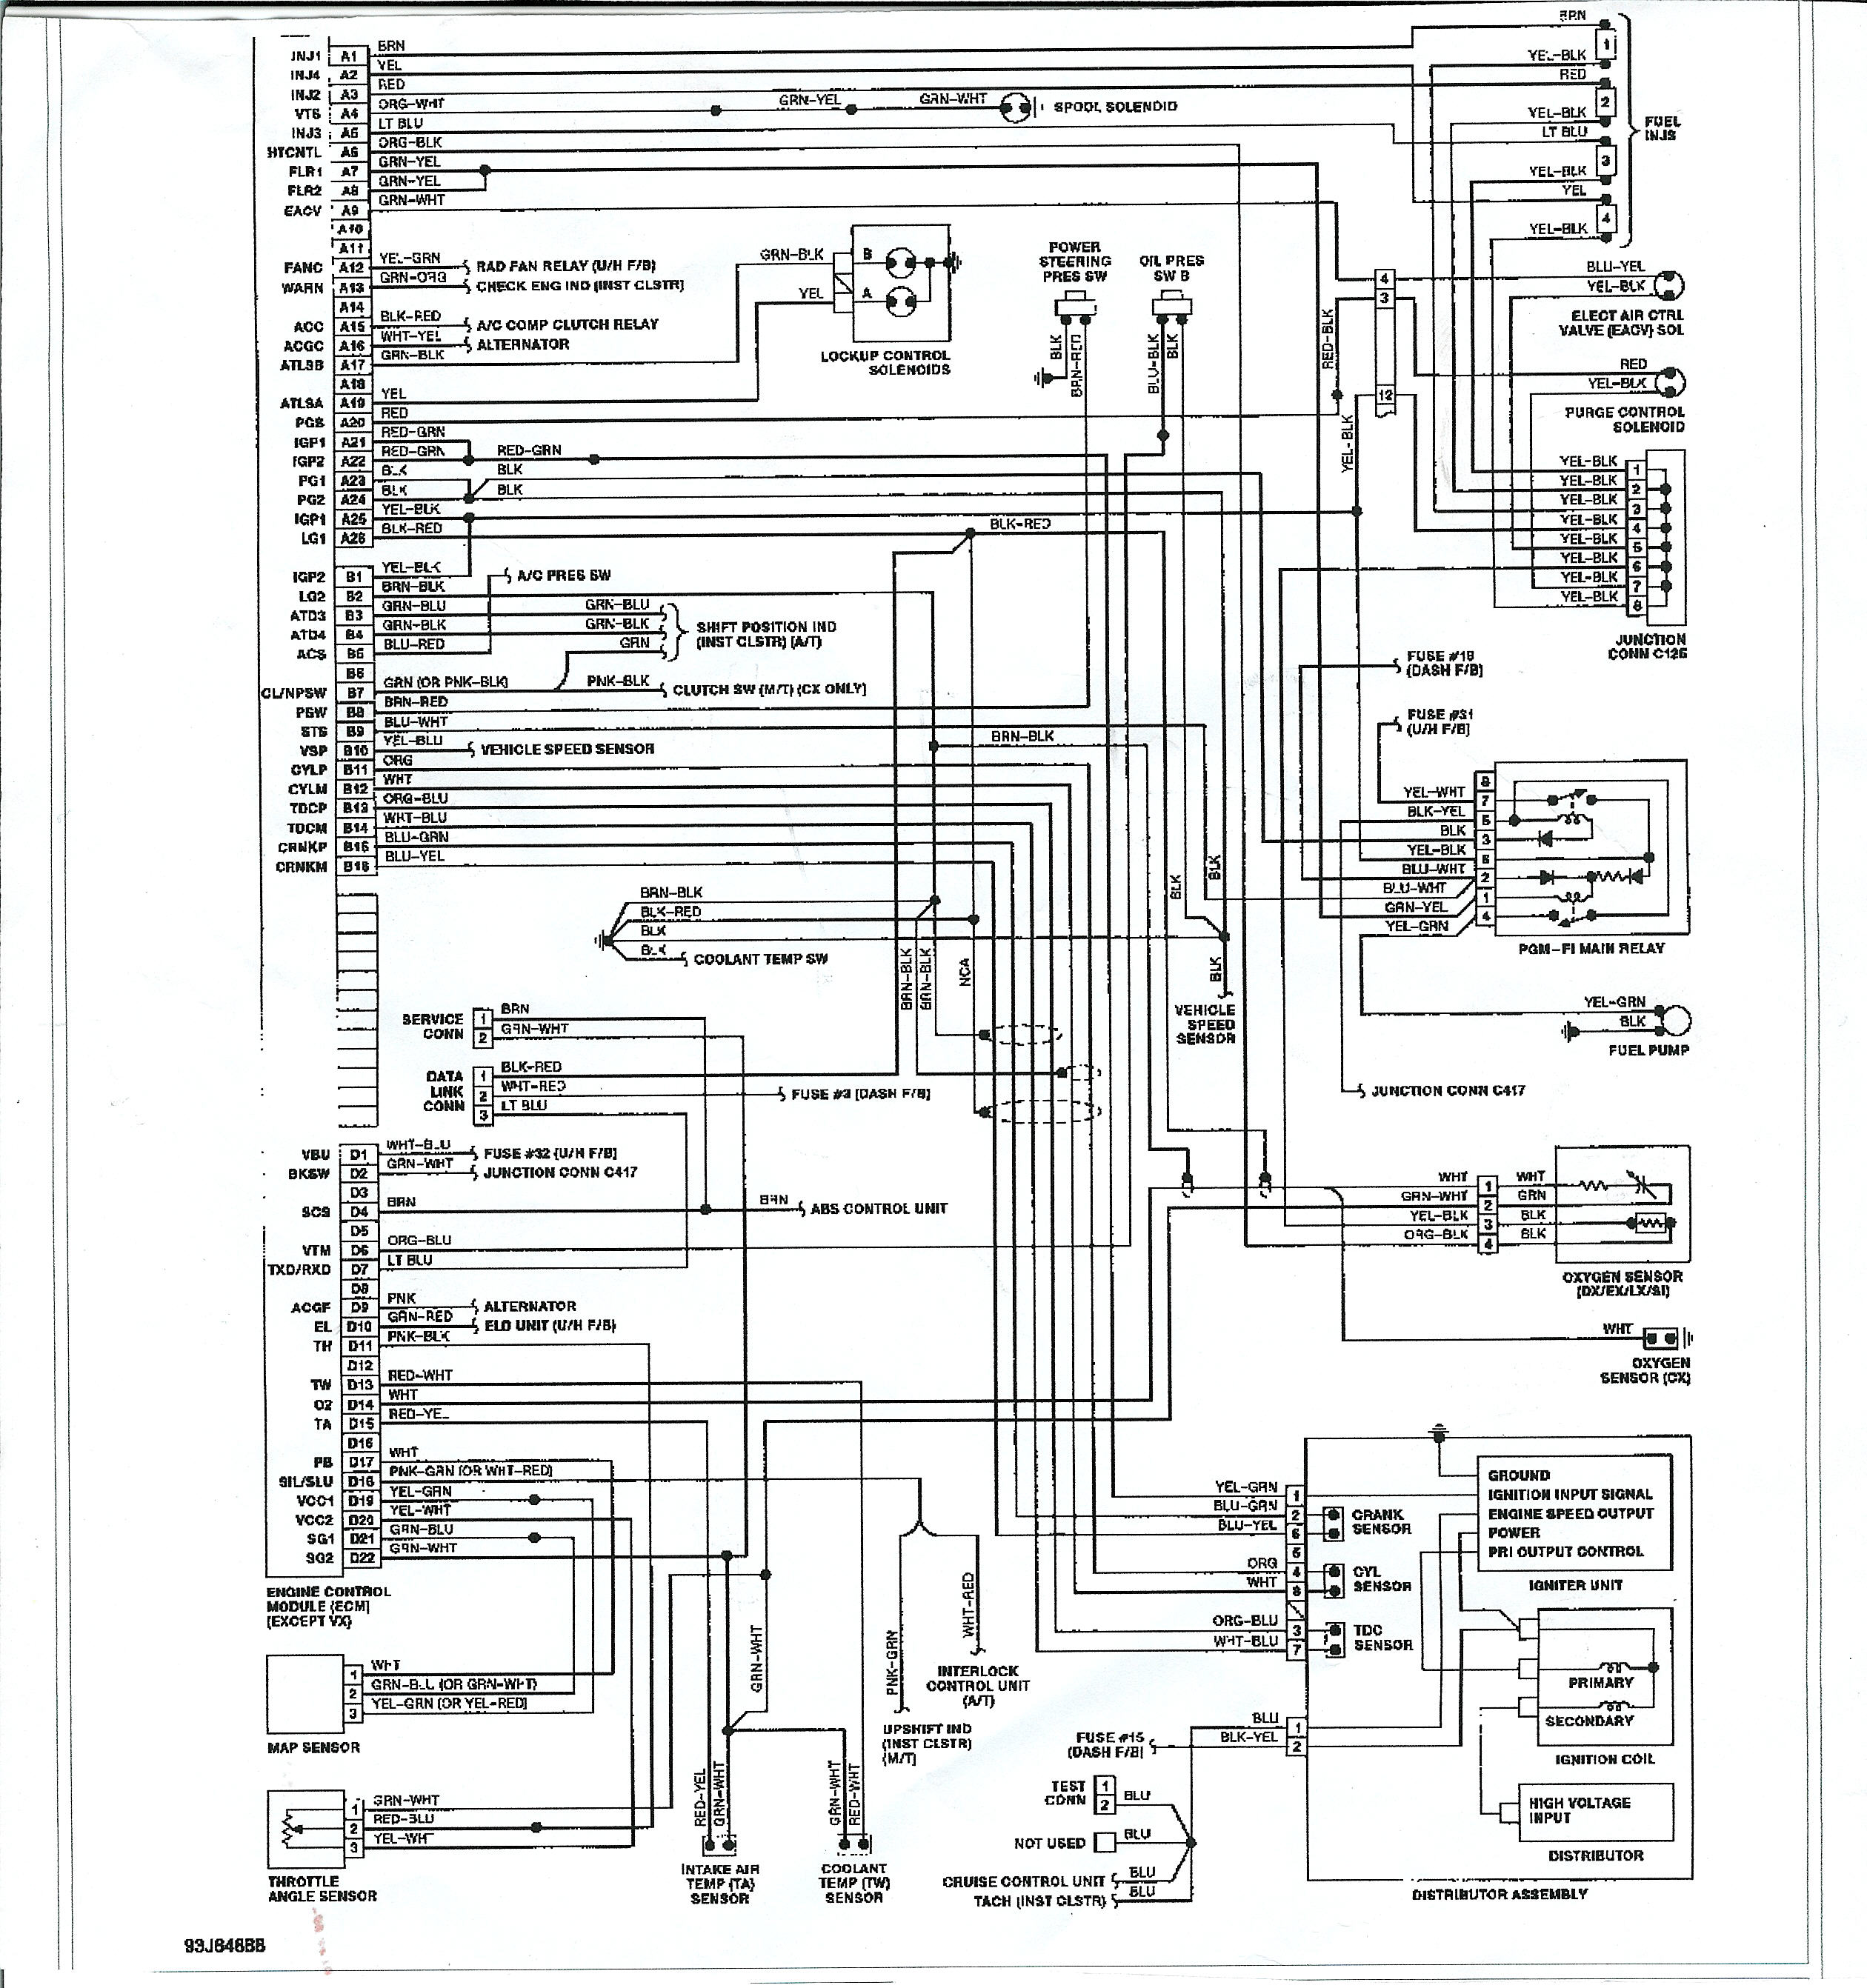 Mustang Wiring Diagram Honda Civic Main Relay